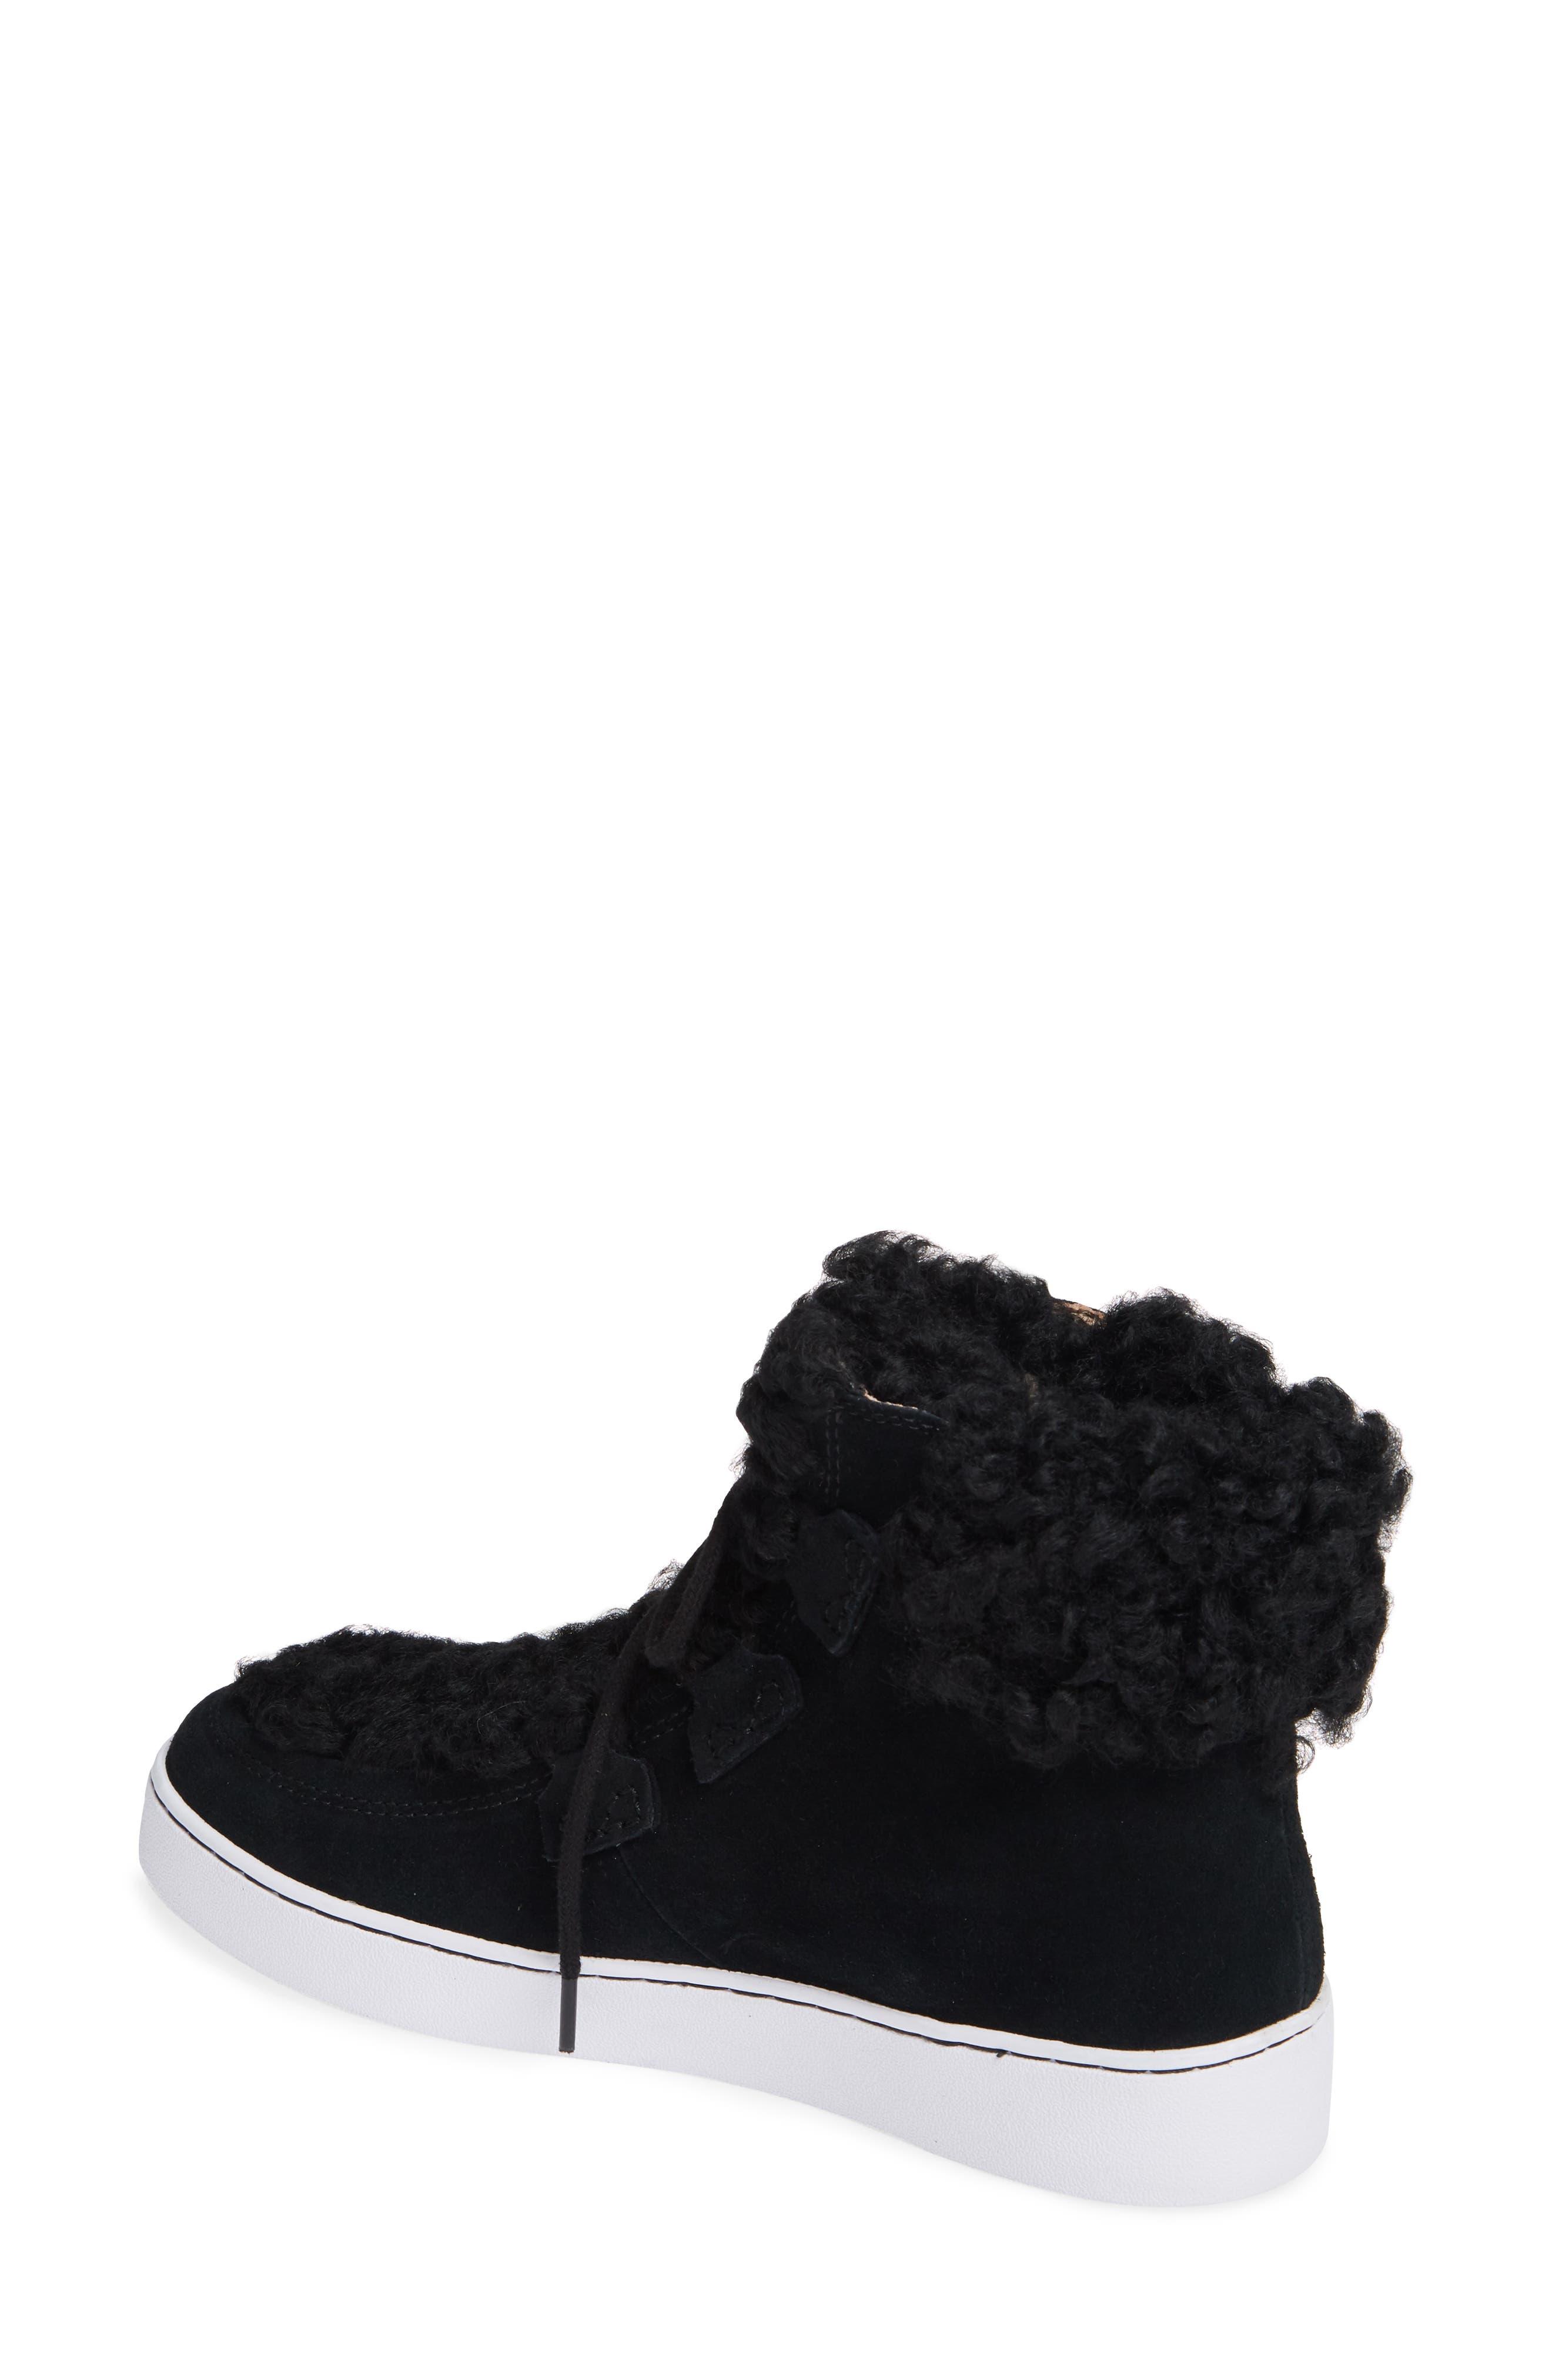 Oak Genuine Shearling Cuff Sneaker Bootie,                             Alternate thumbnail 2, color,                             BLACK SUEDE